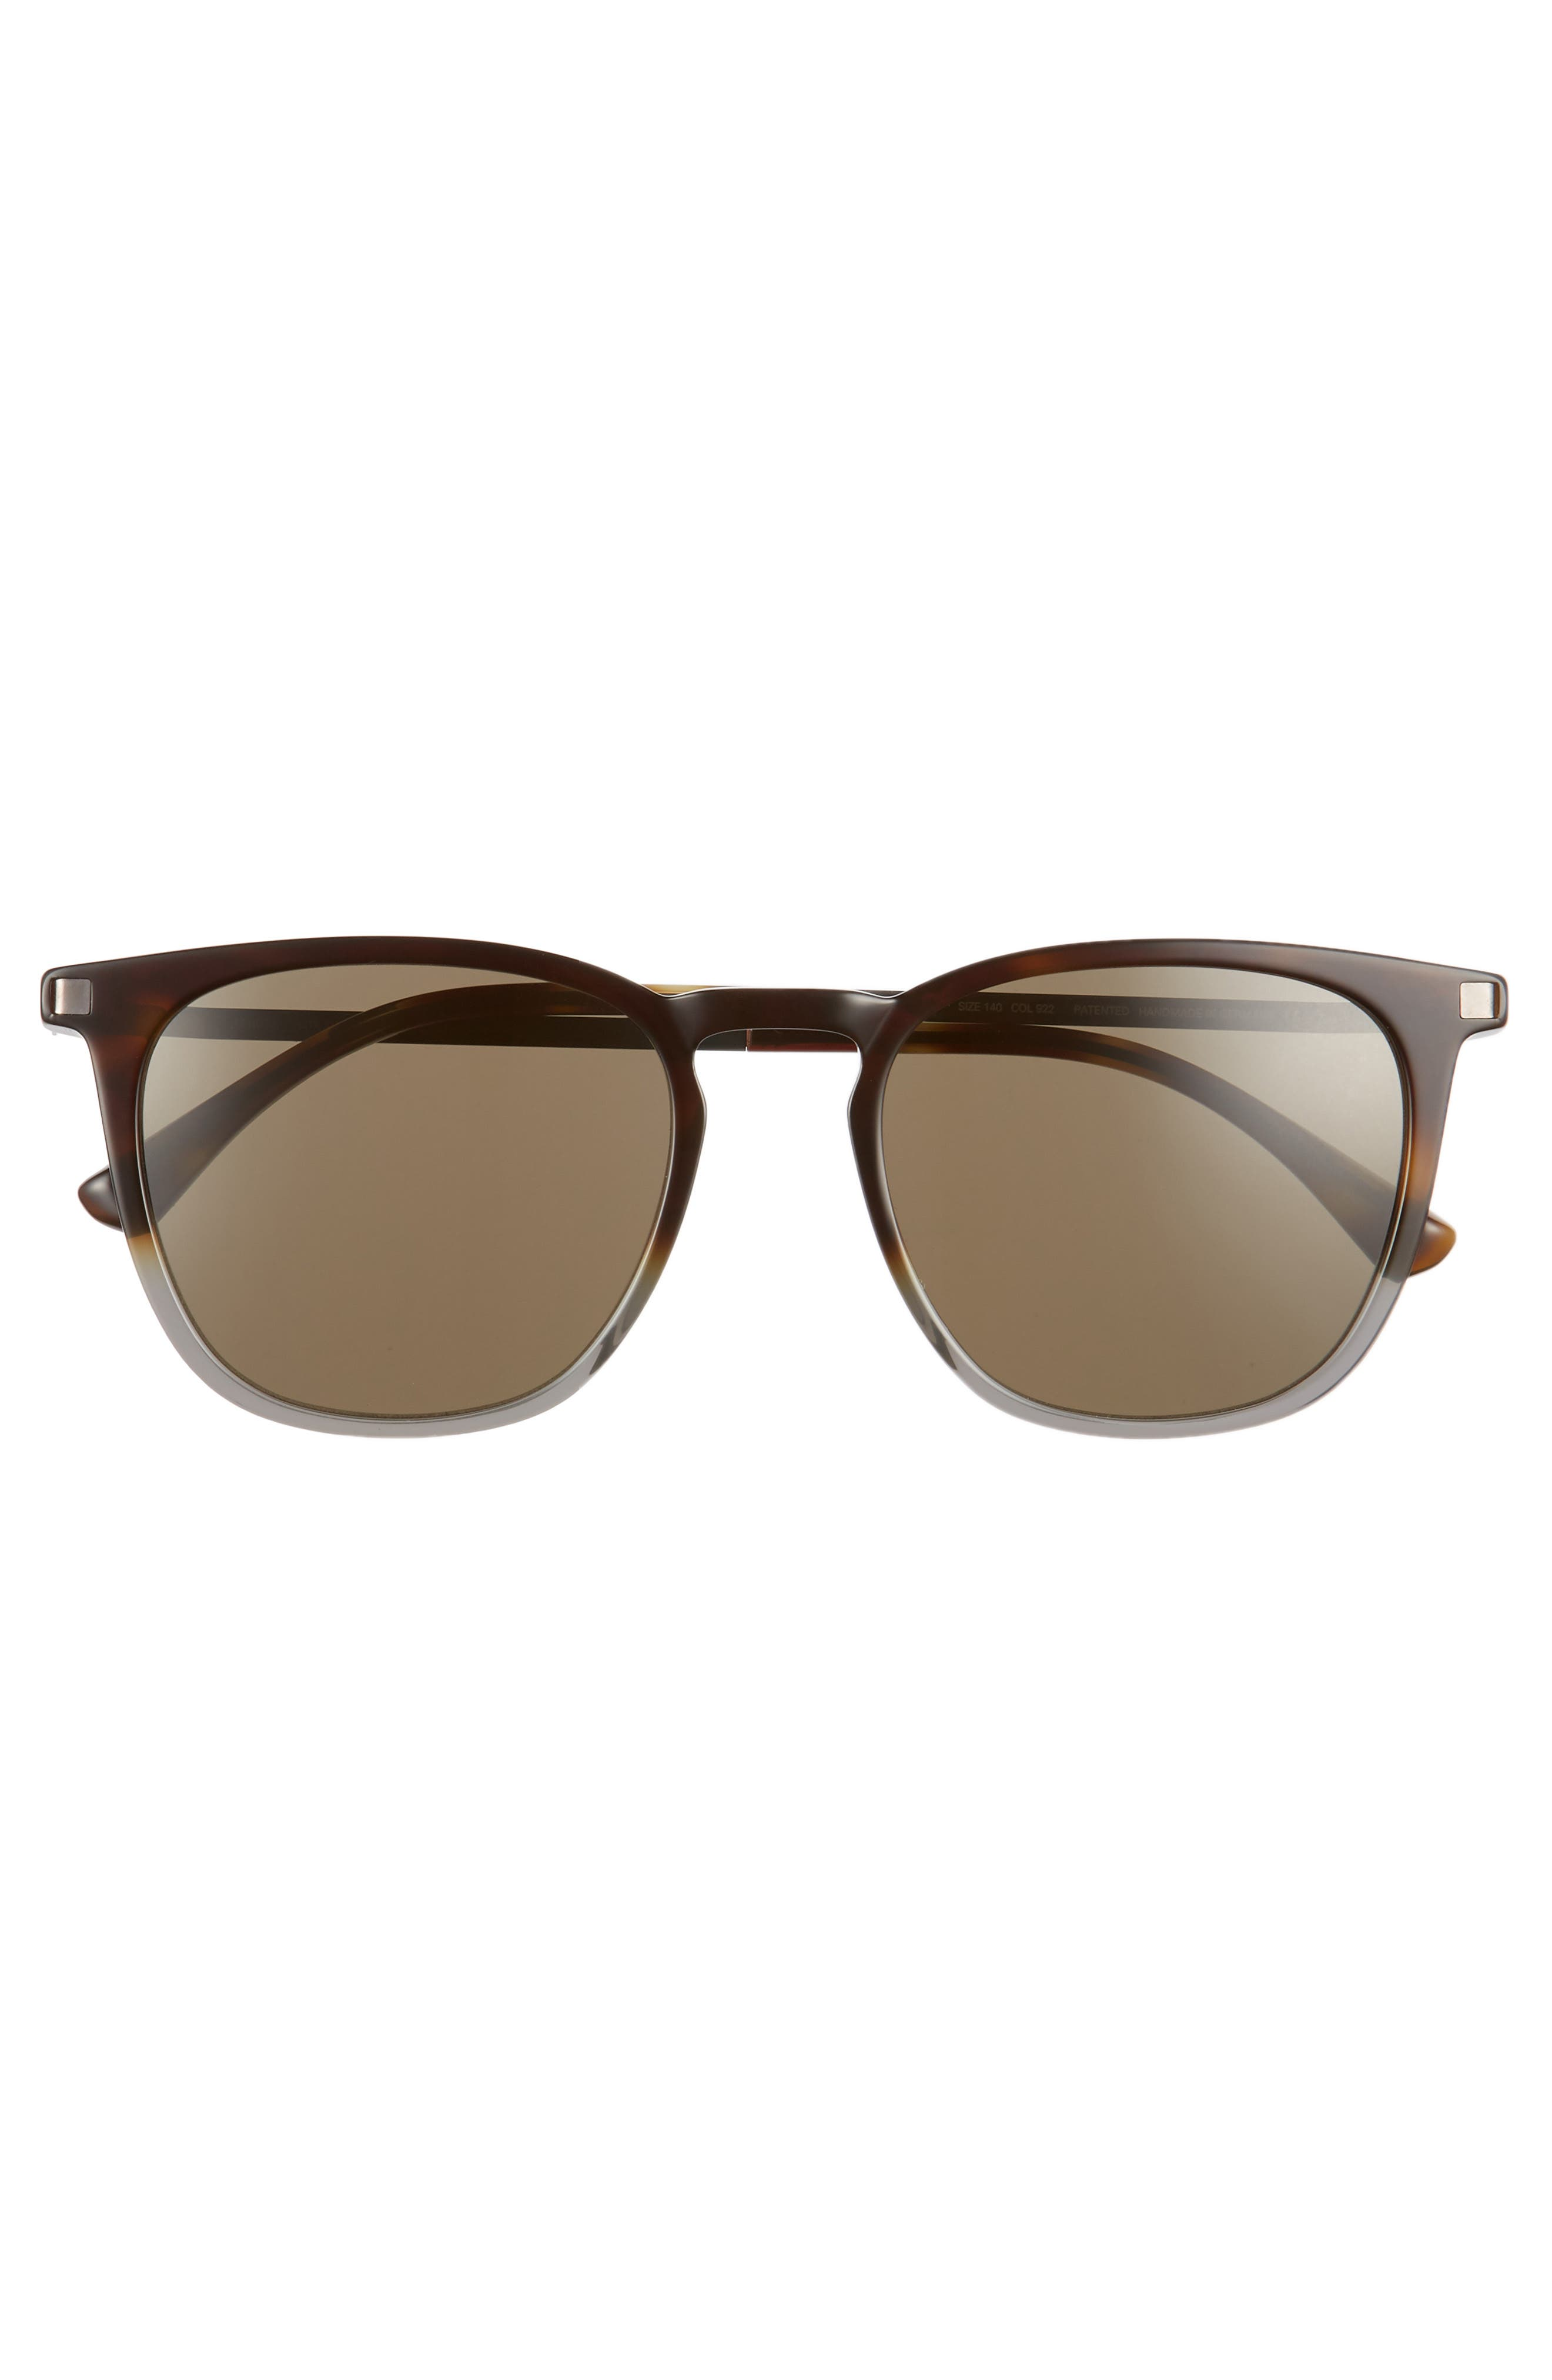 Eska 51mm Sunglasses,                             Alternate thumbnail 2, color,                             Santiago Gradient/ Graphite